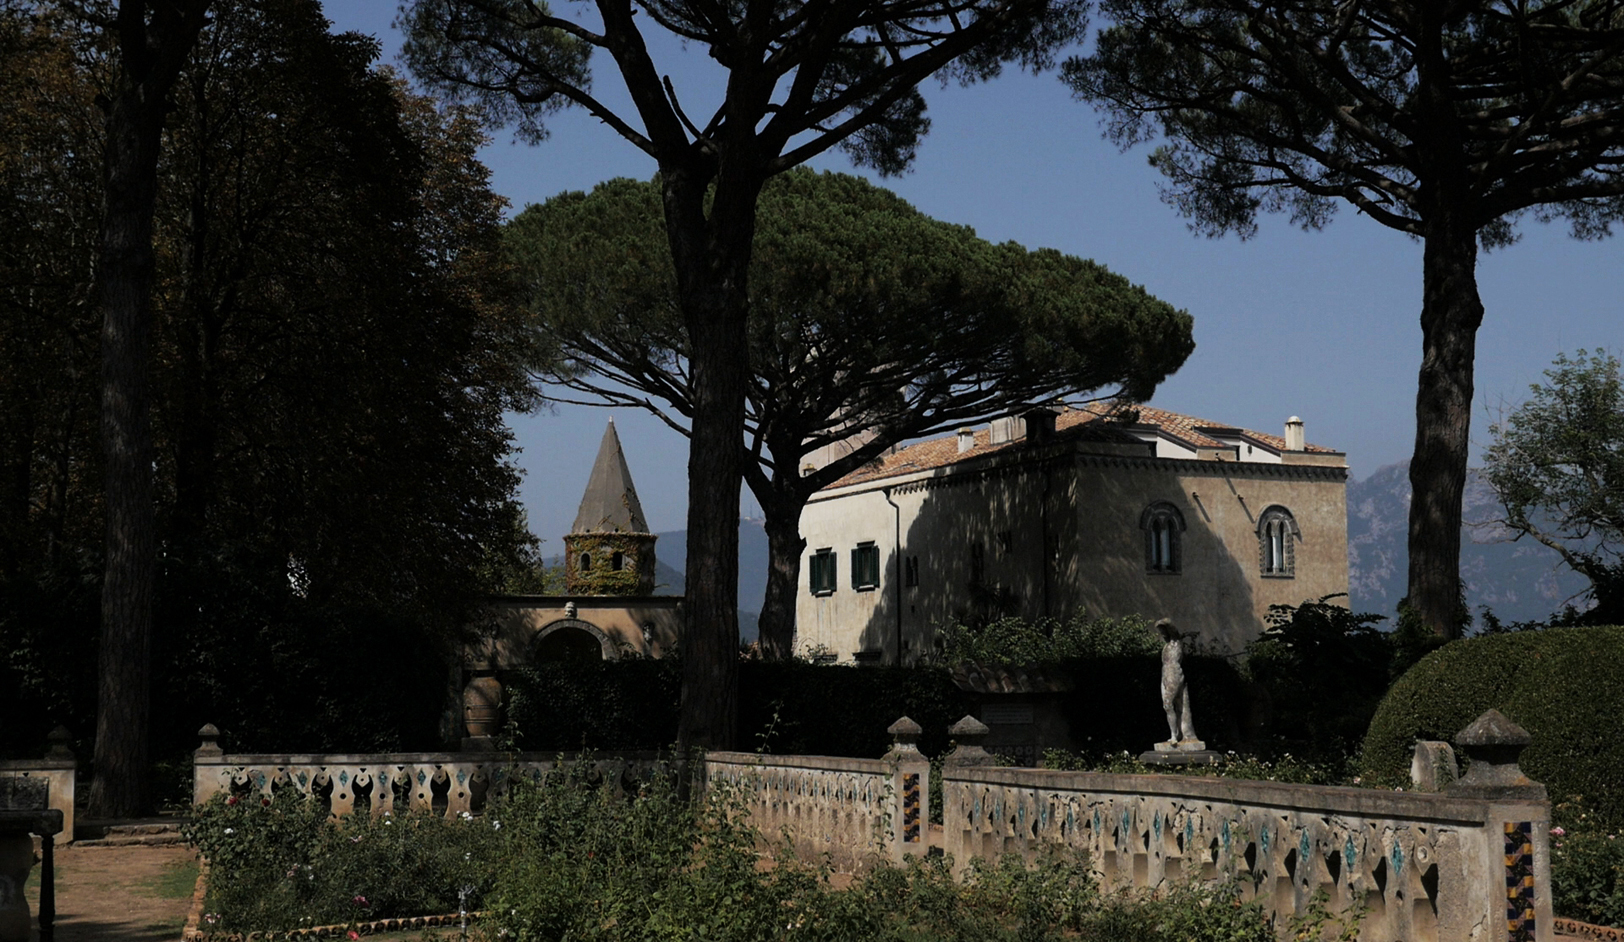 matrimonio-a-ravello-villa-cimbrone-amalfi-ravello.jpg